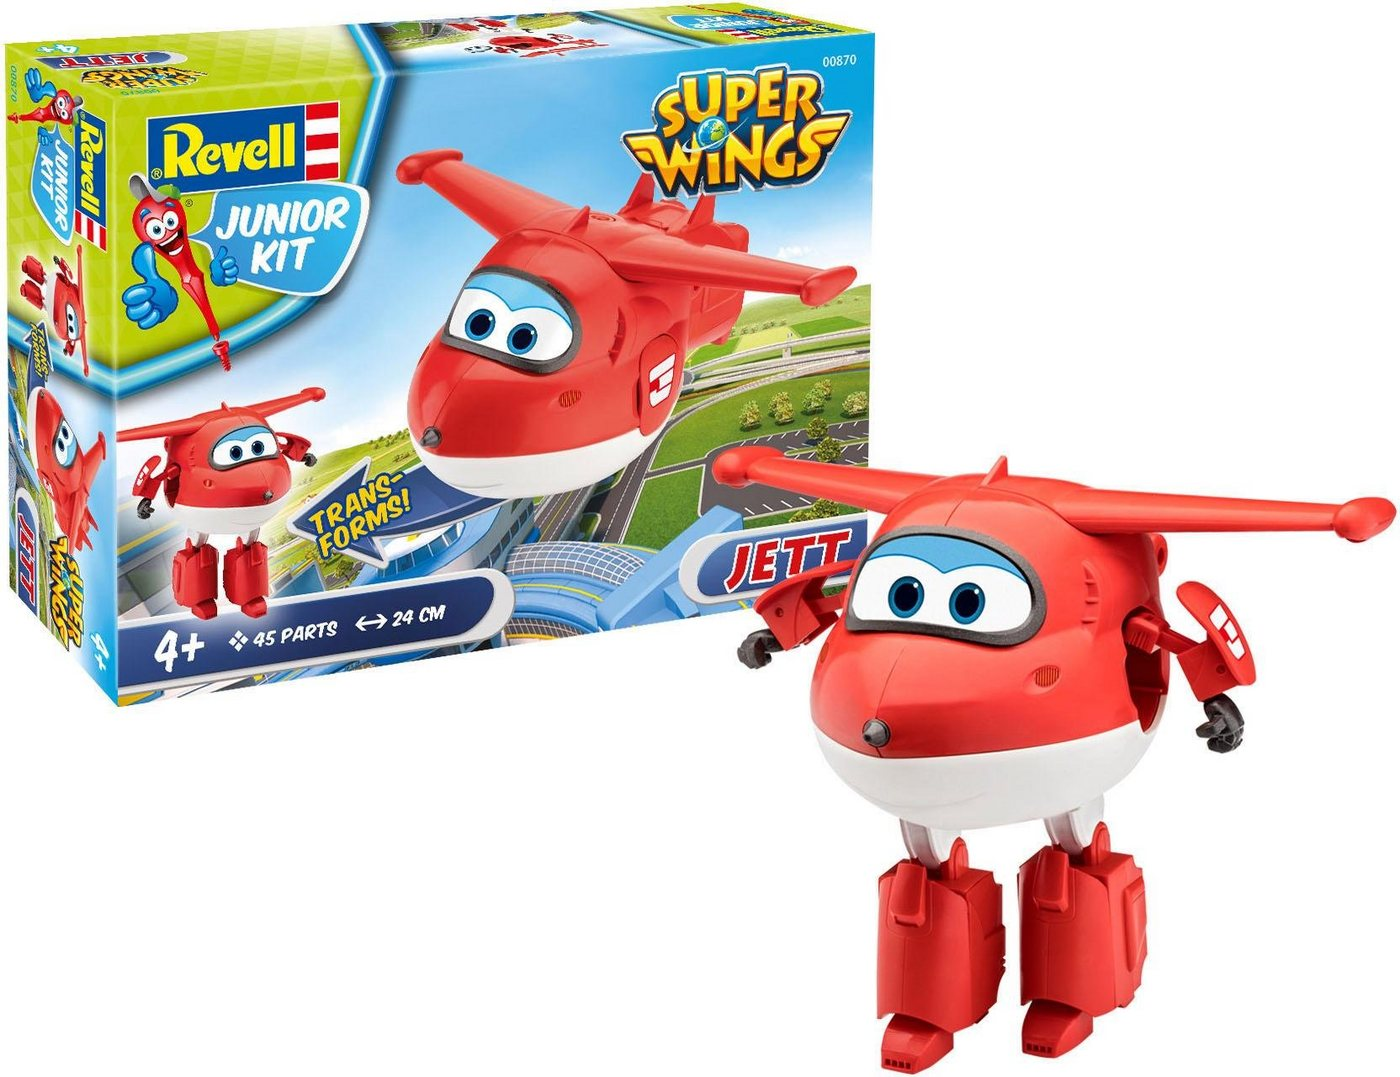 Revell Modellbausatz transformierbares Flugzeug, »Junior Kit Super Wings Jett«